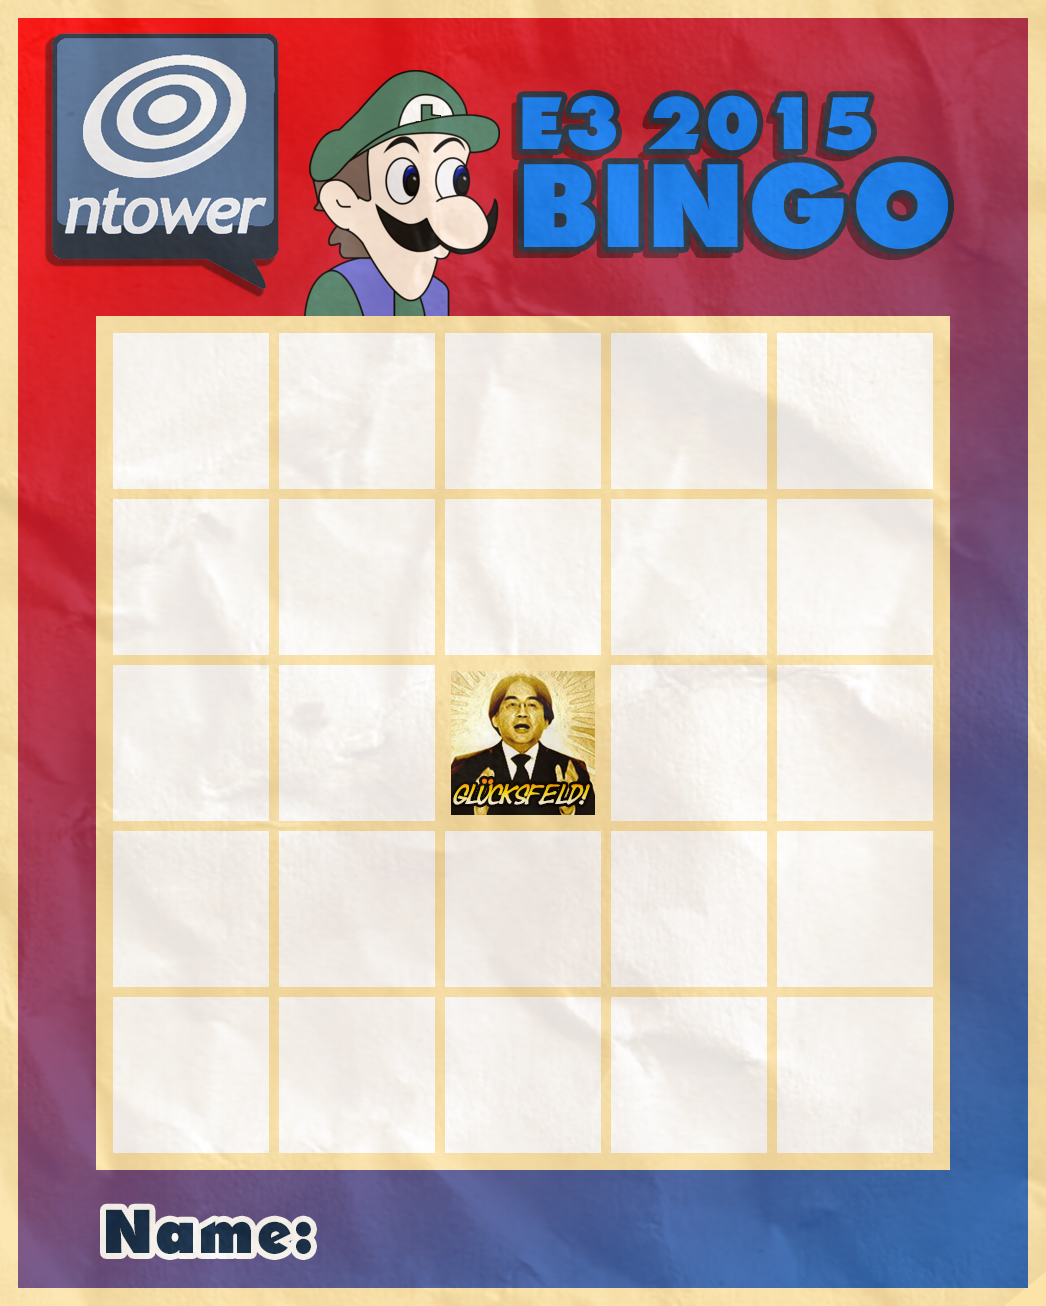 bingo wie geht das